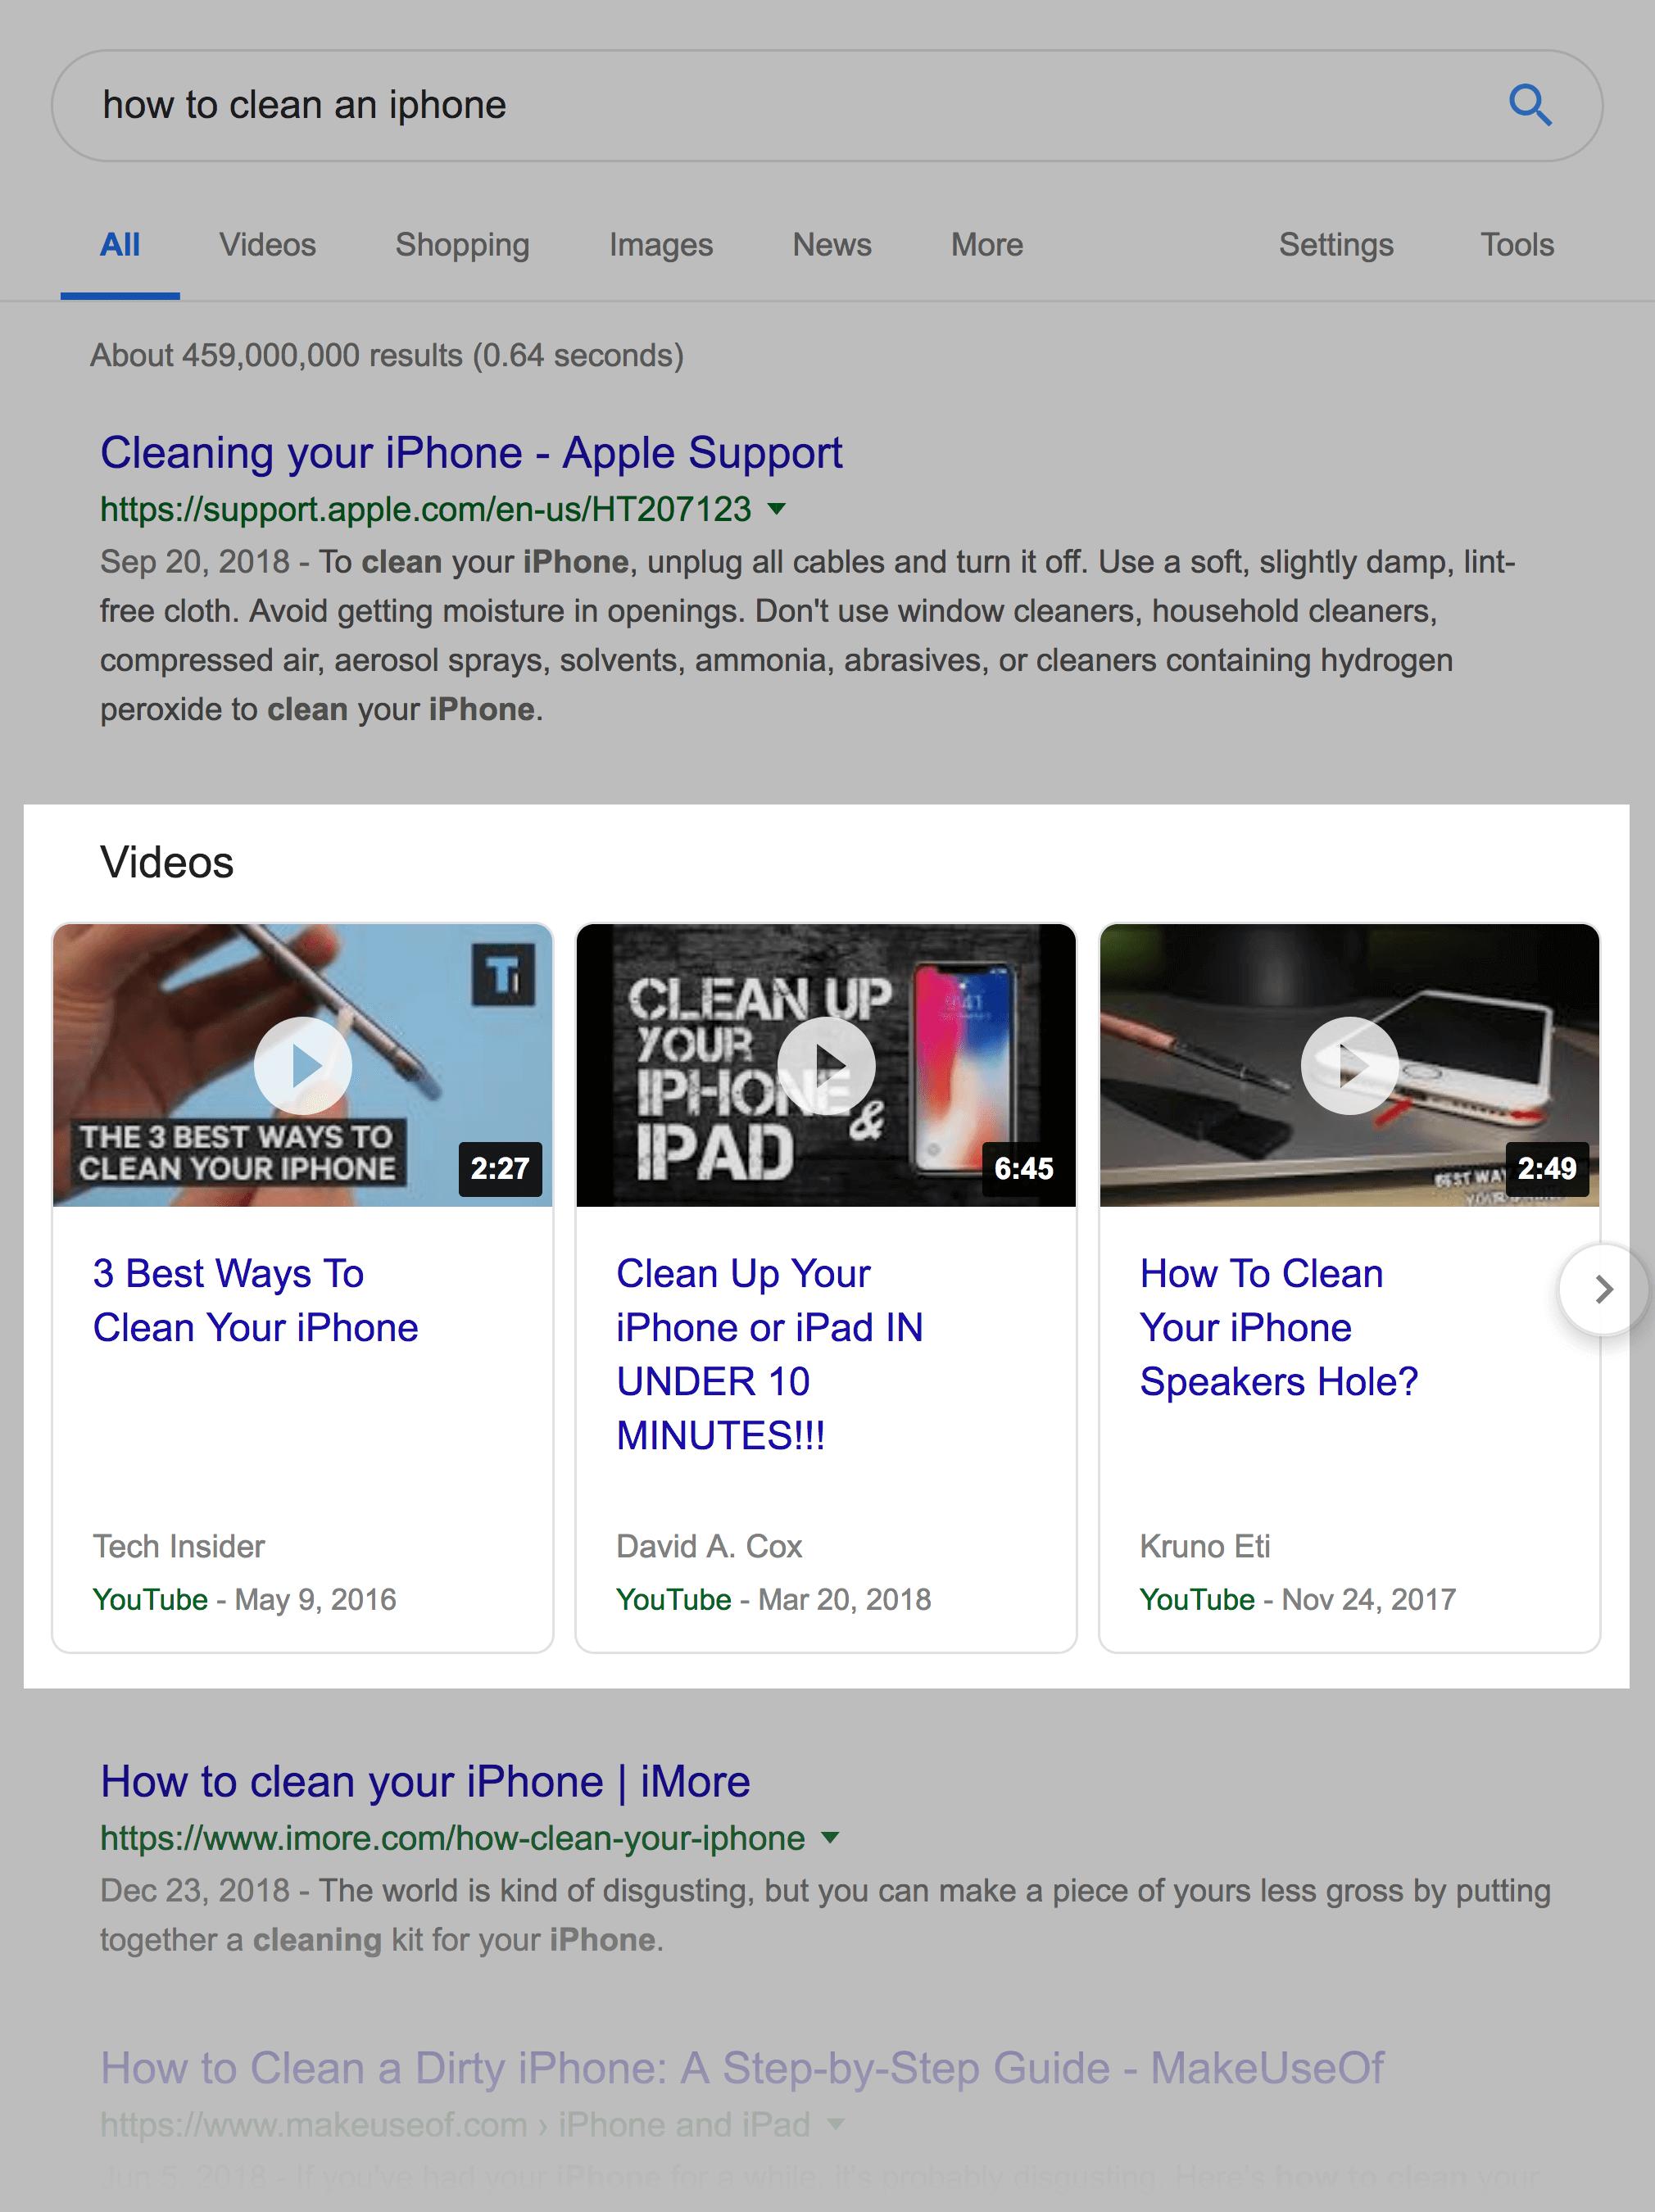 Video keywords